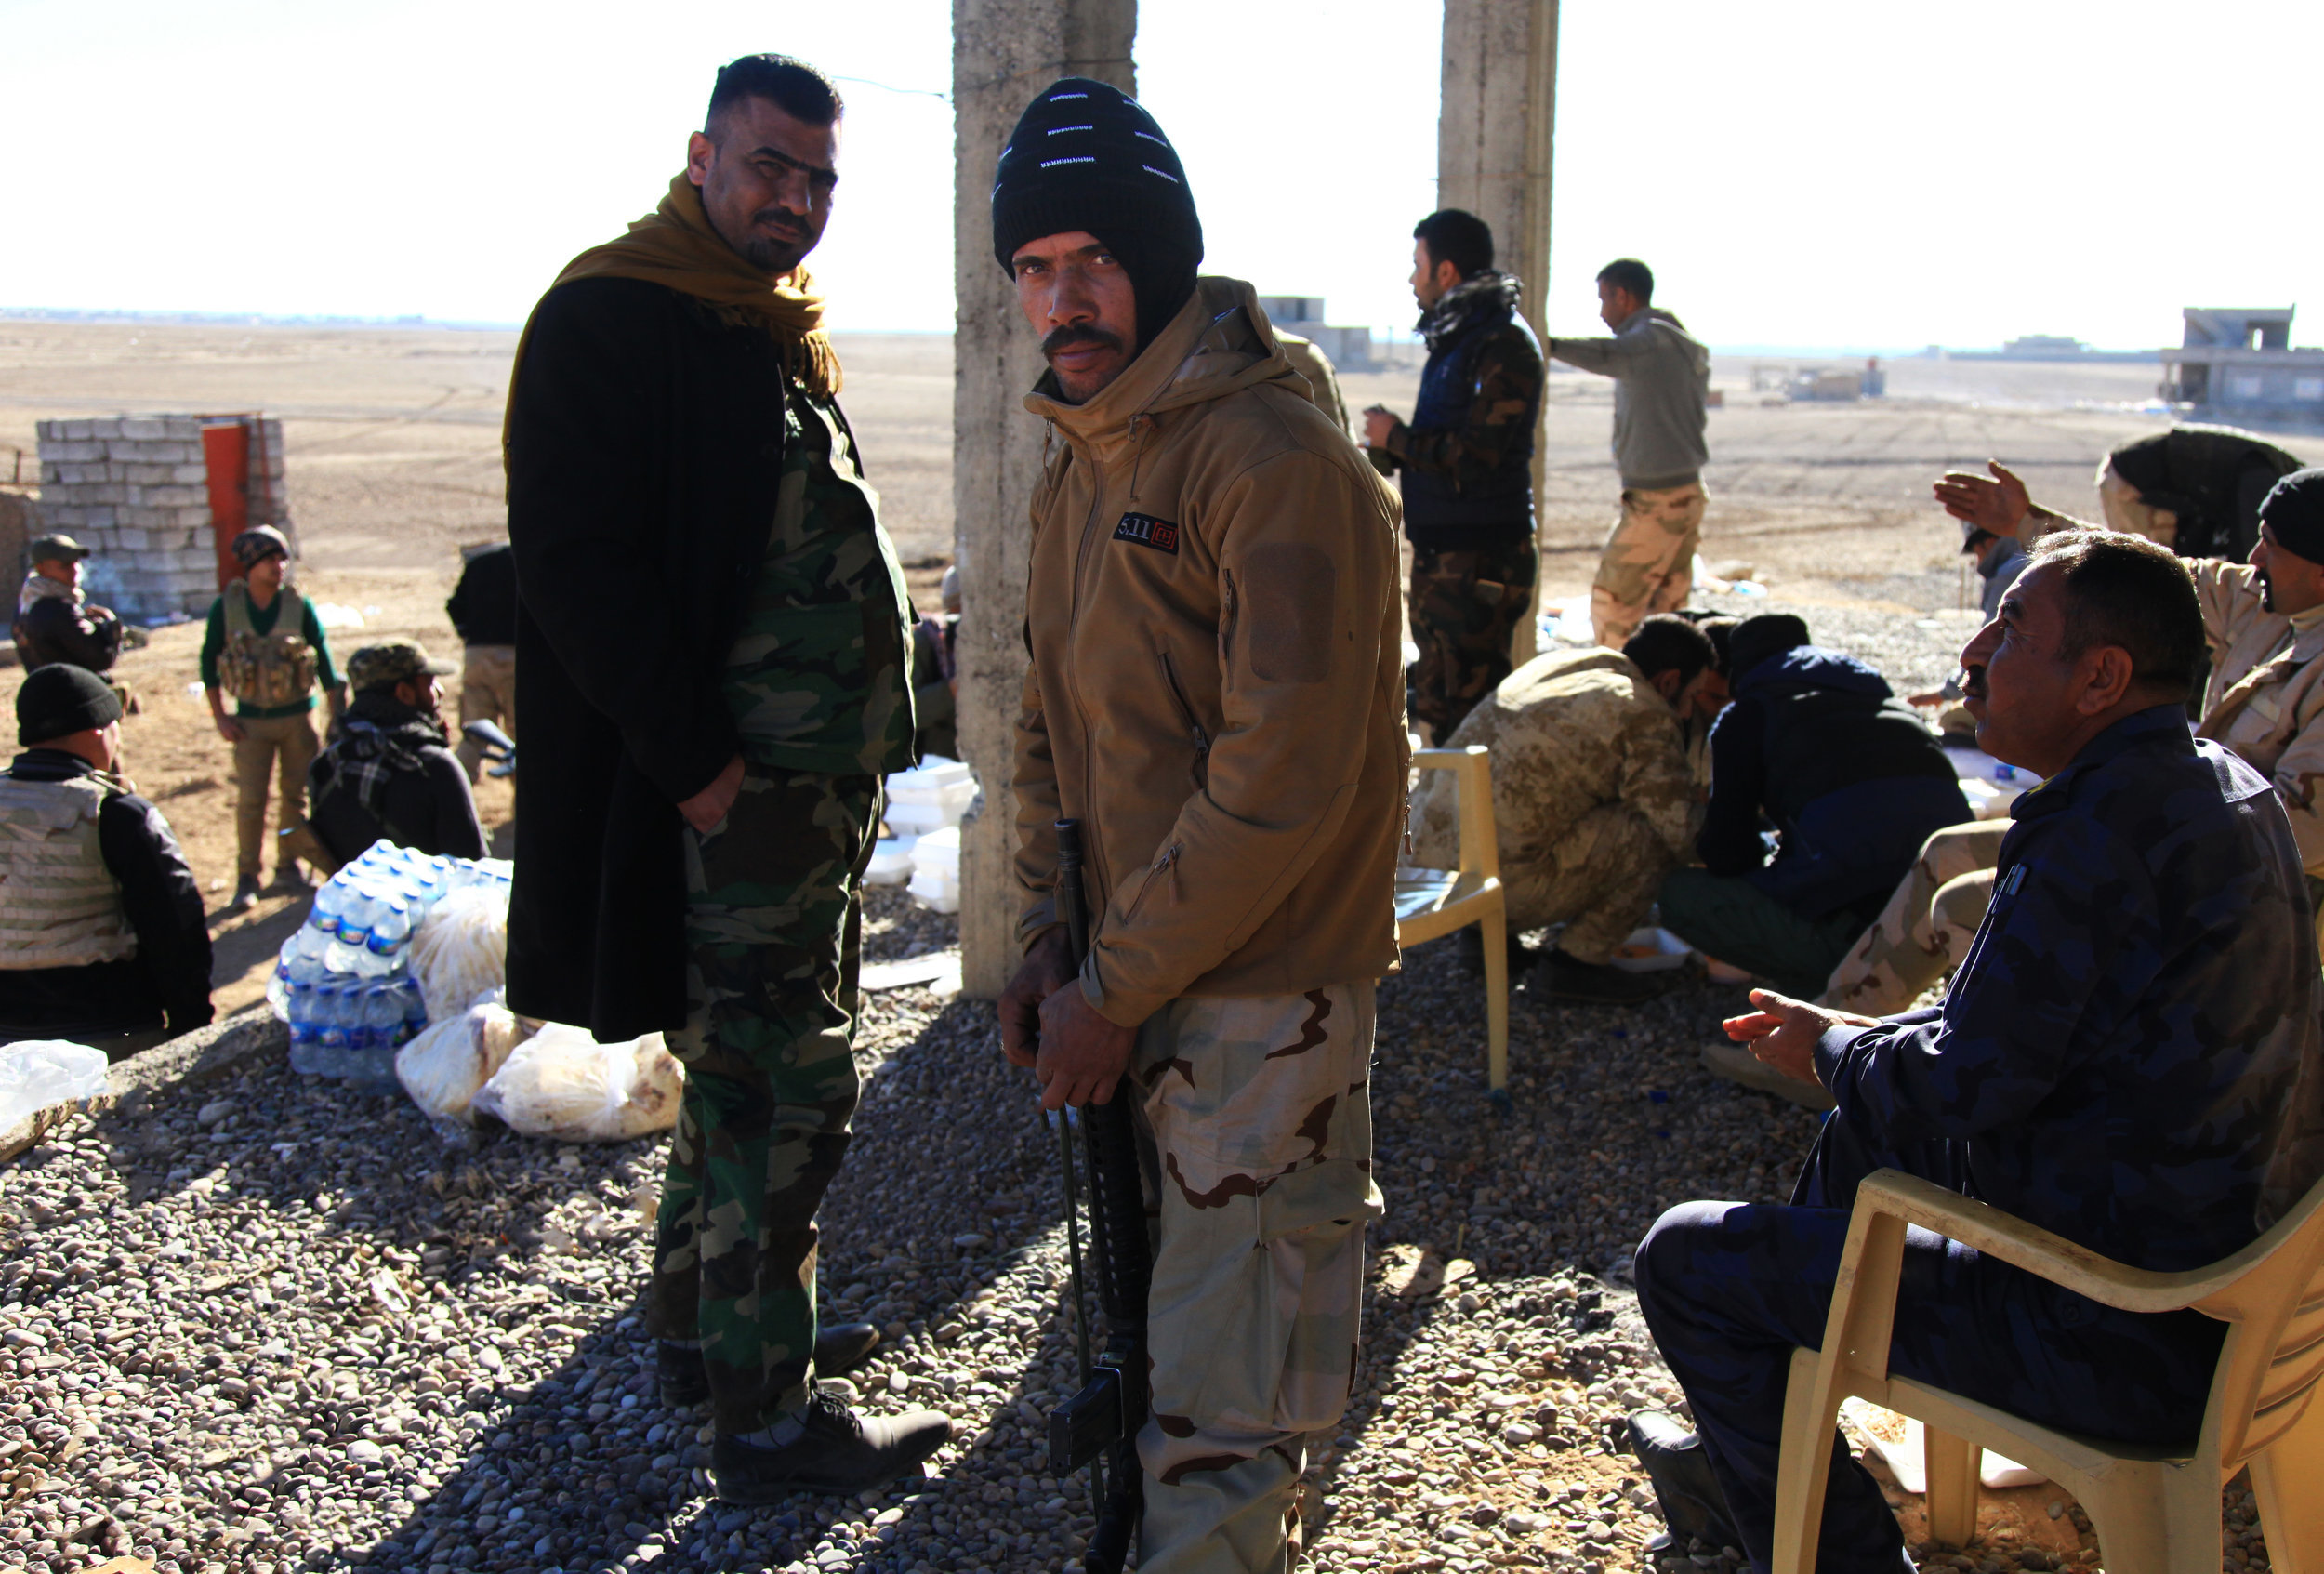 Soldaten an der Front